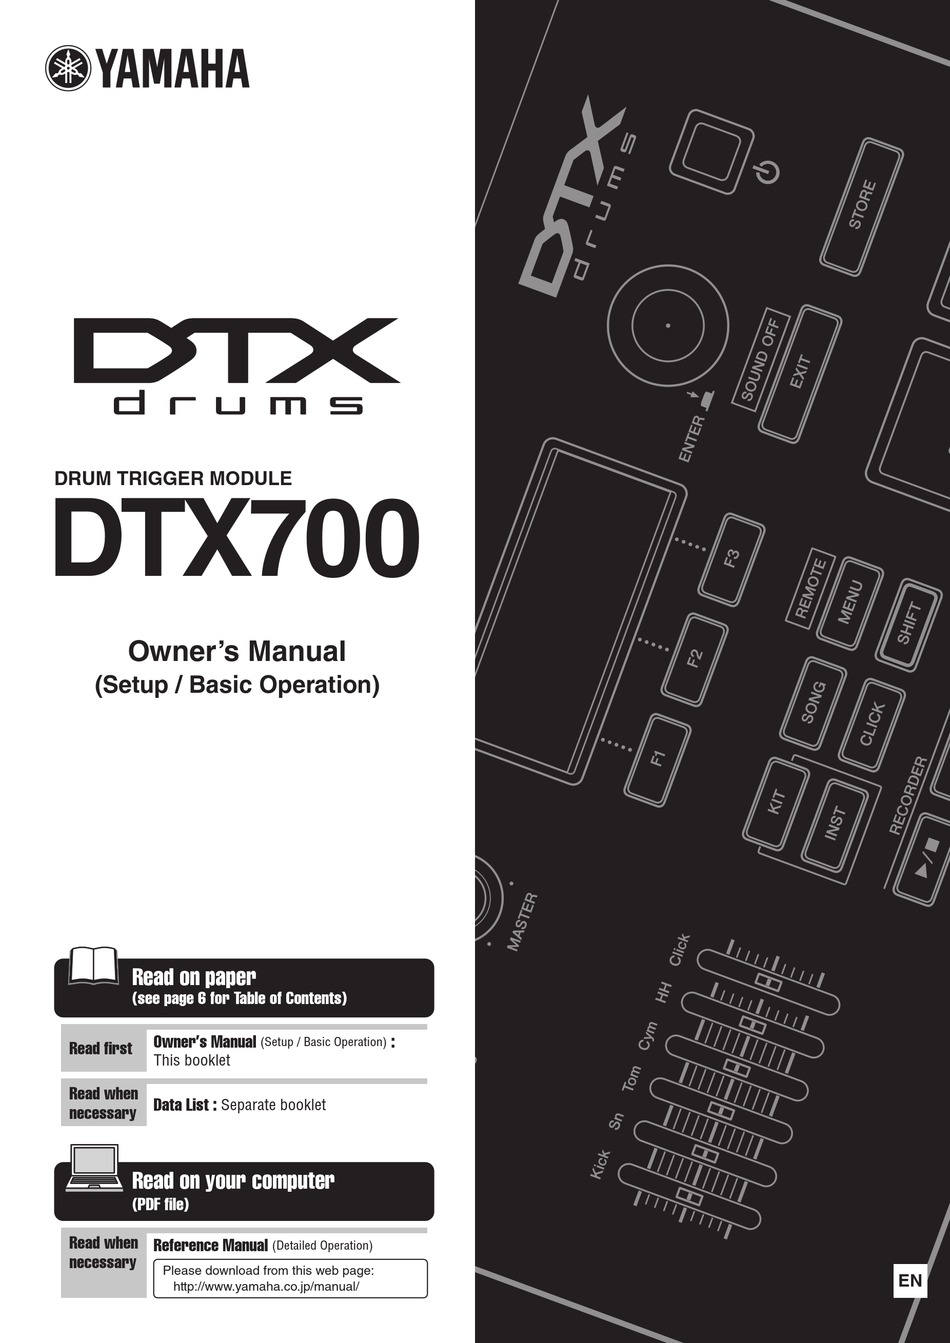 Yamaha Dtx700 Owner S Manual Pdf Download Manualslib